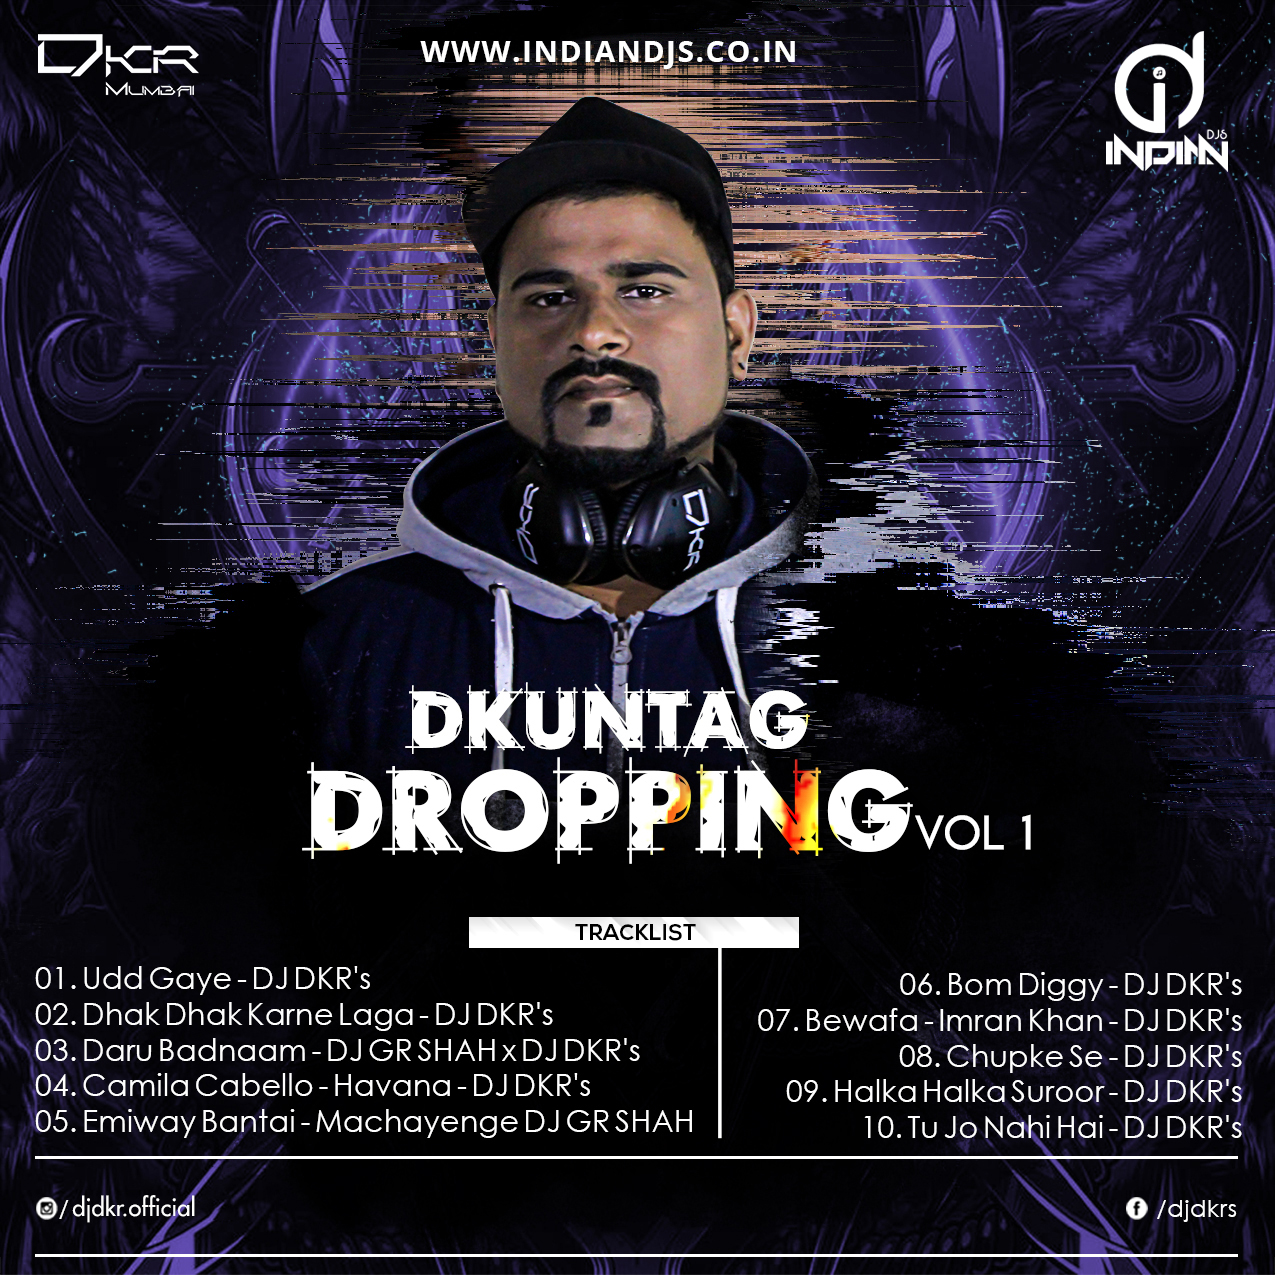 latest-free-djs-song-music-dj-remixes-download-bollywood-mp3-hindi-song-in-dj-dj-remixes-320Kbps